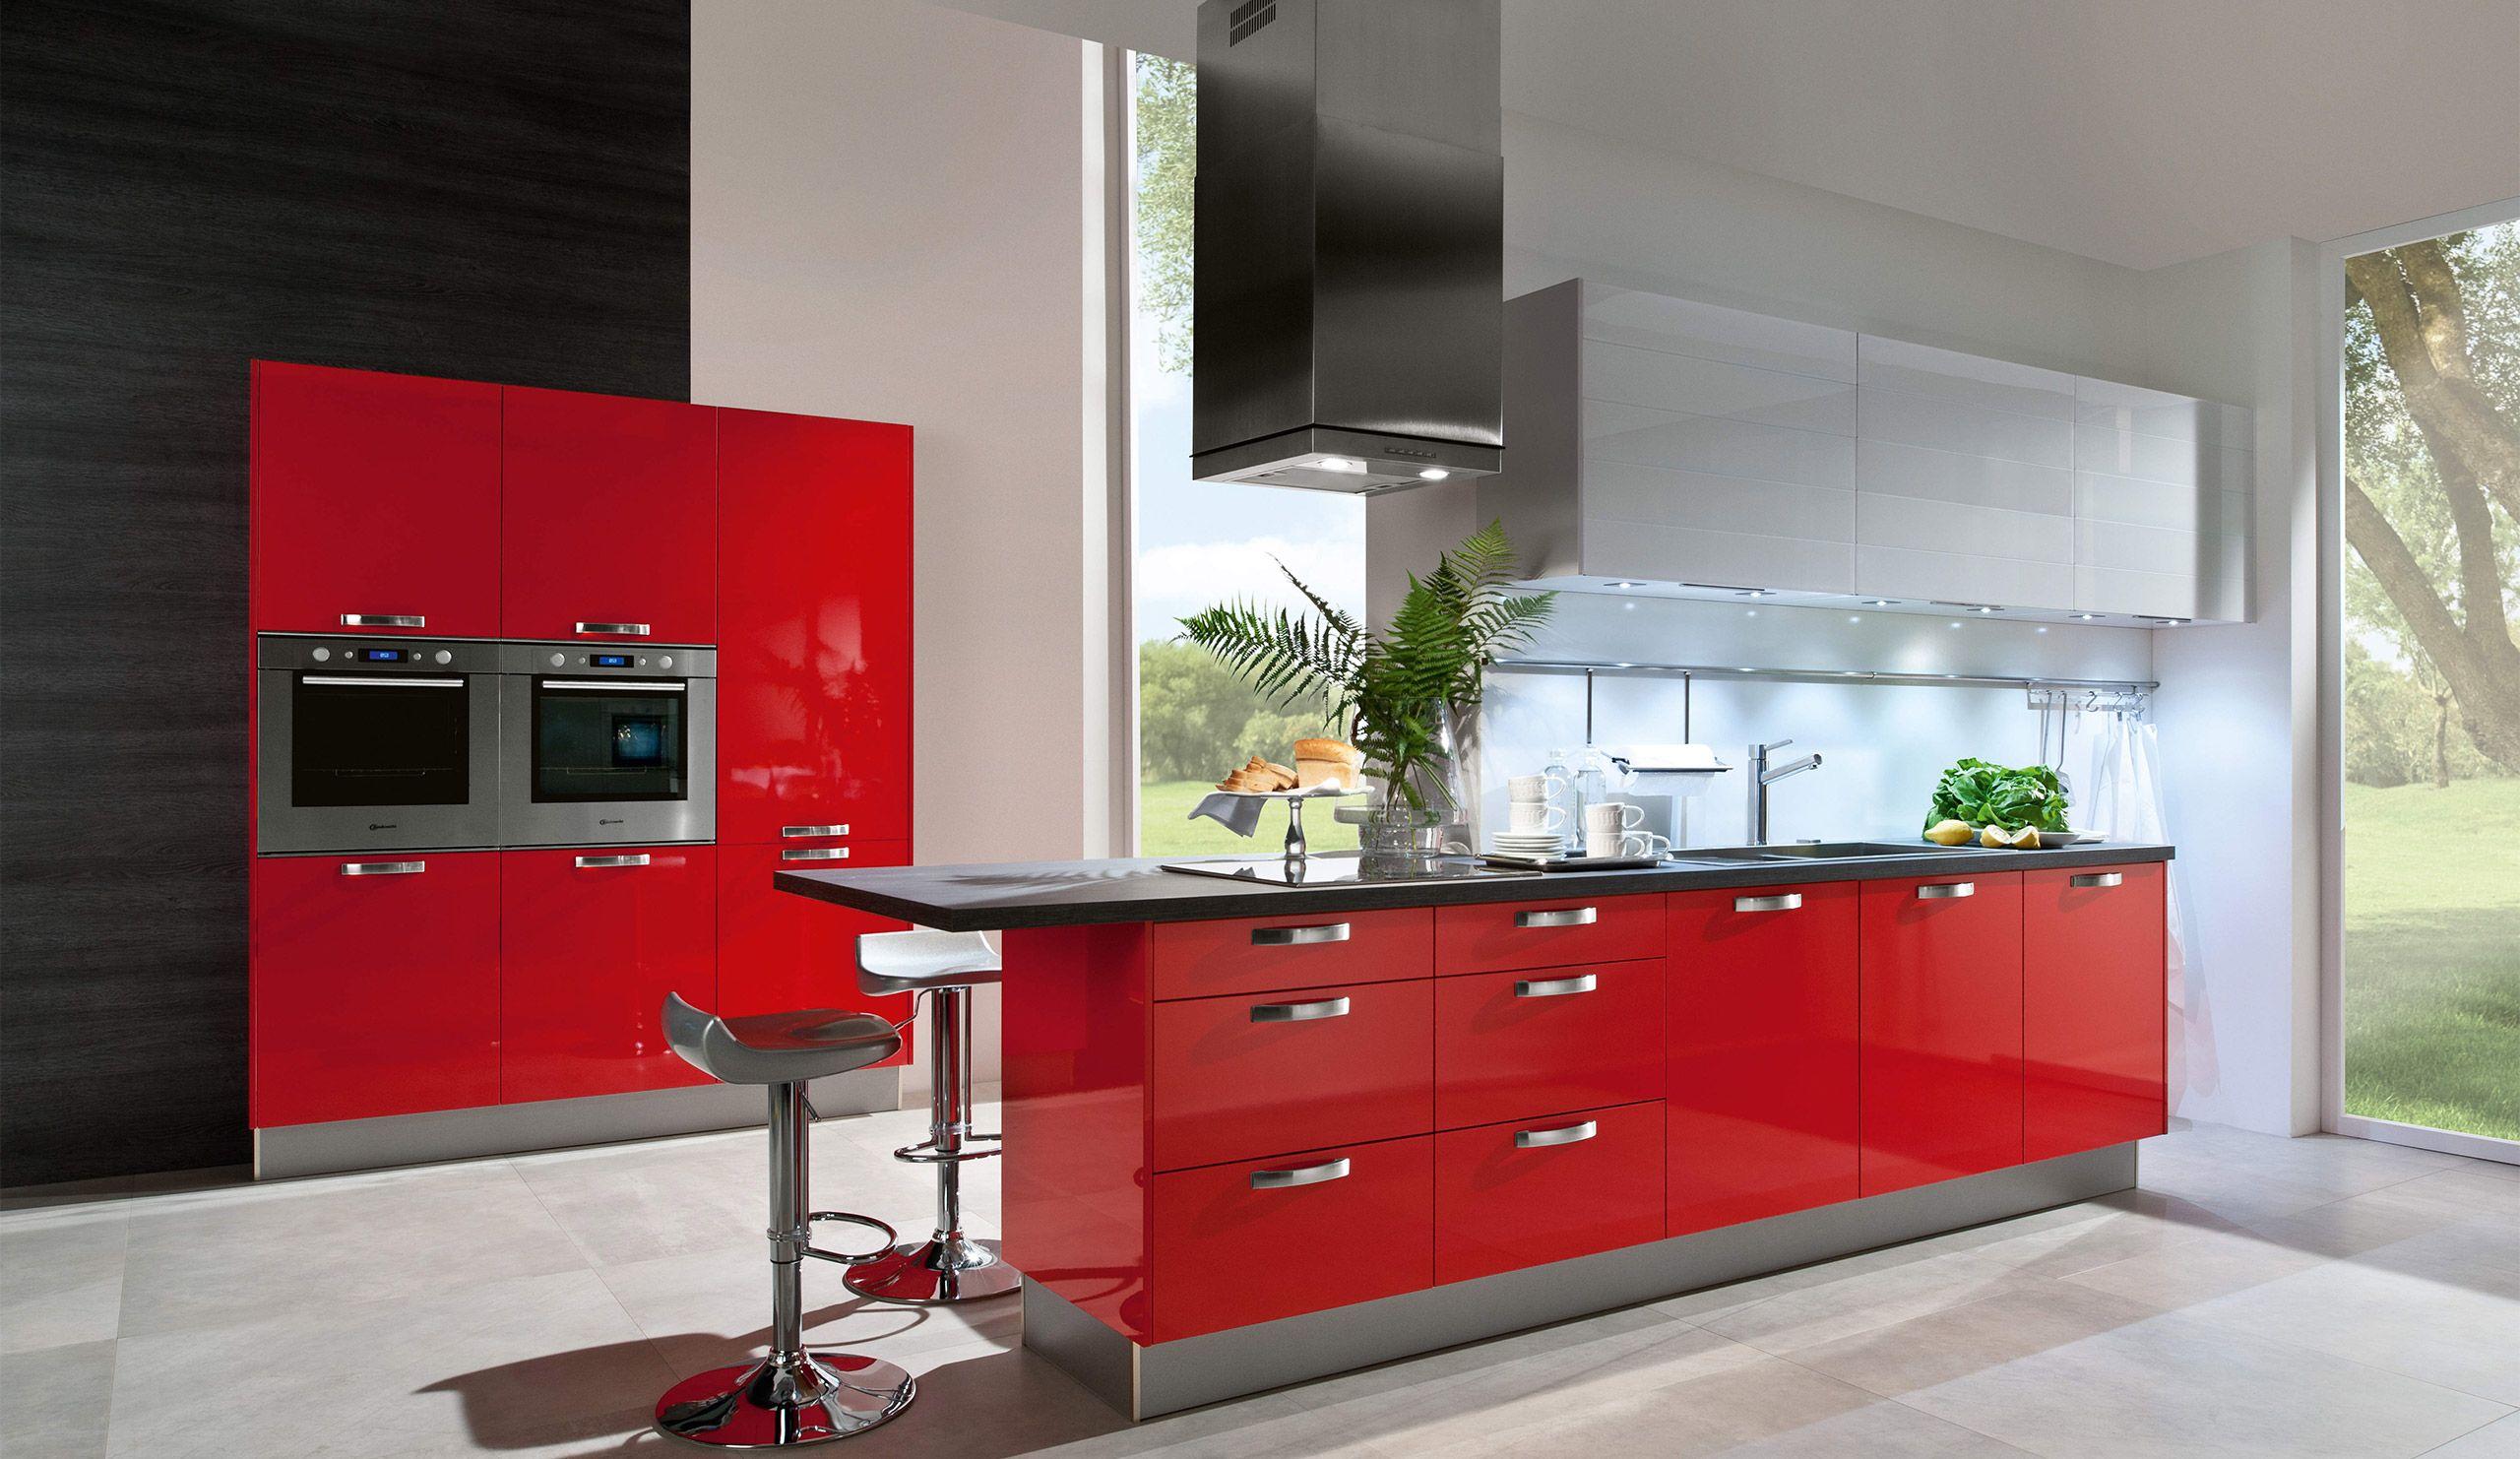 einbauk che aspen hochglanz rot haus pinterest. Black Bedroom Furniture Sets. Home Design Ideas